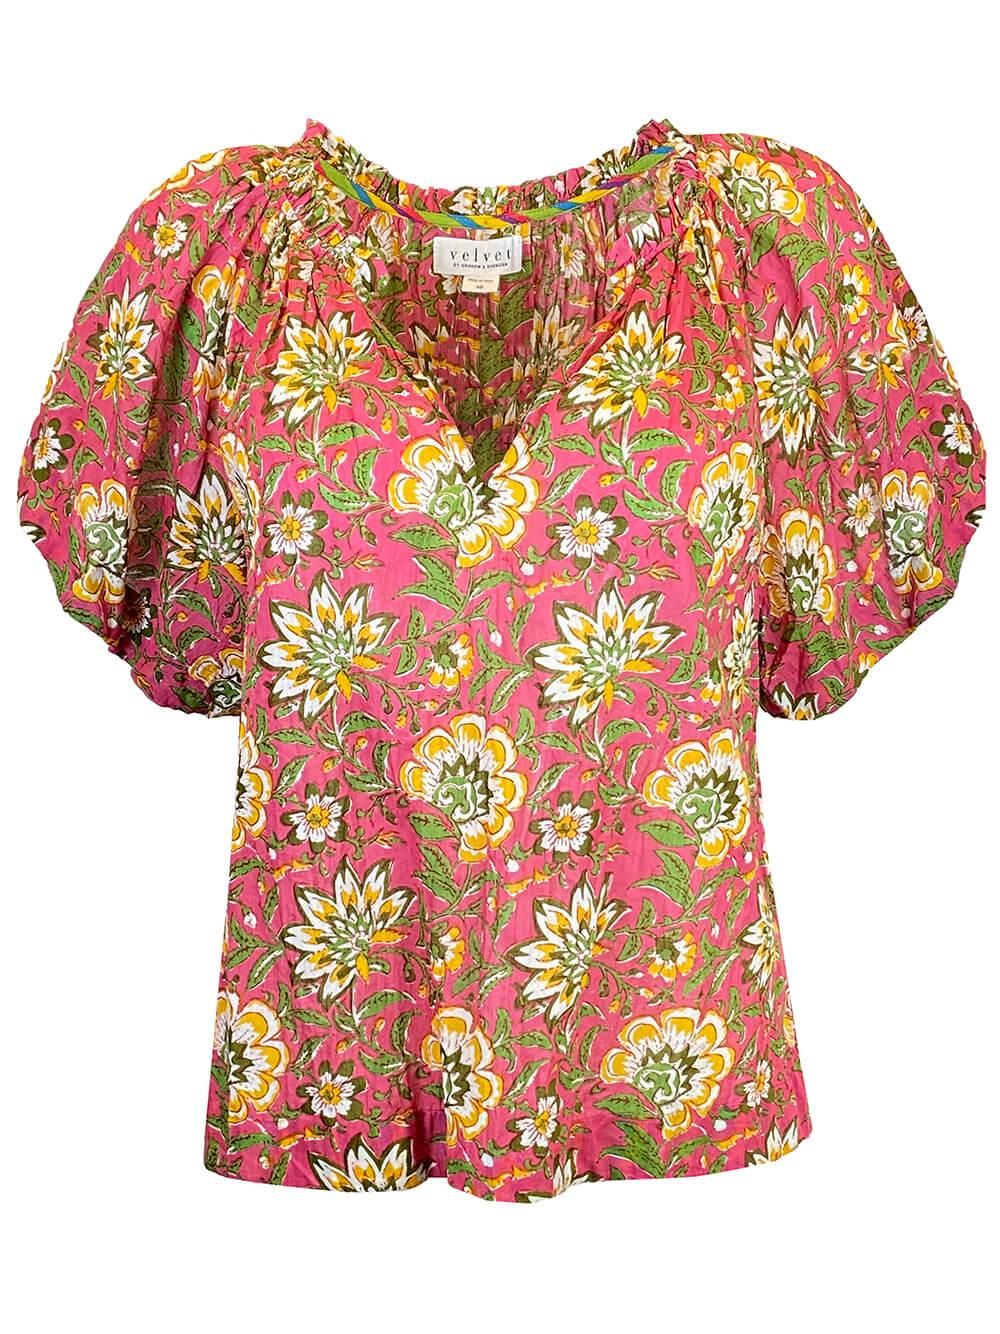 Printed Floral Short Sleeve Top Item # DESTINY04